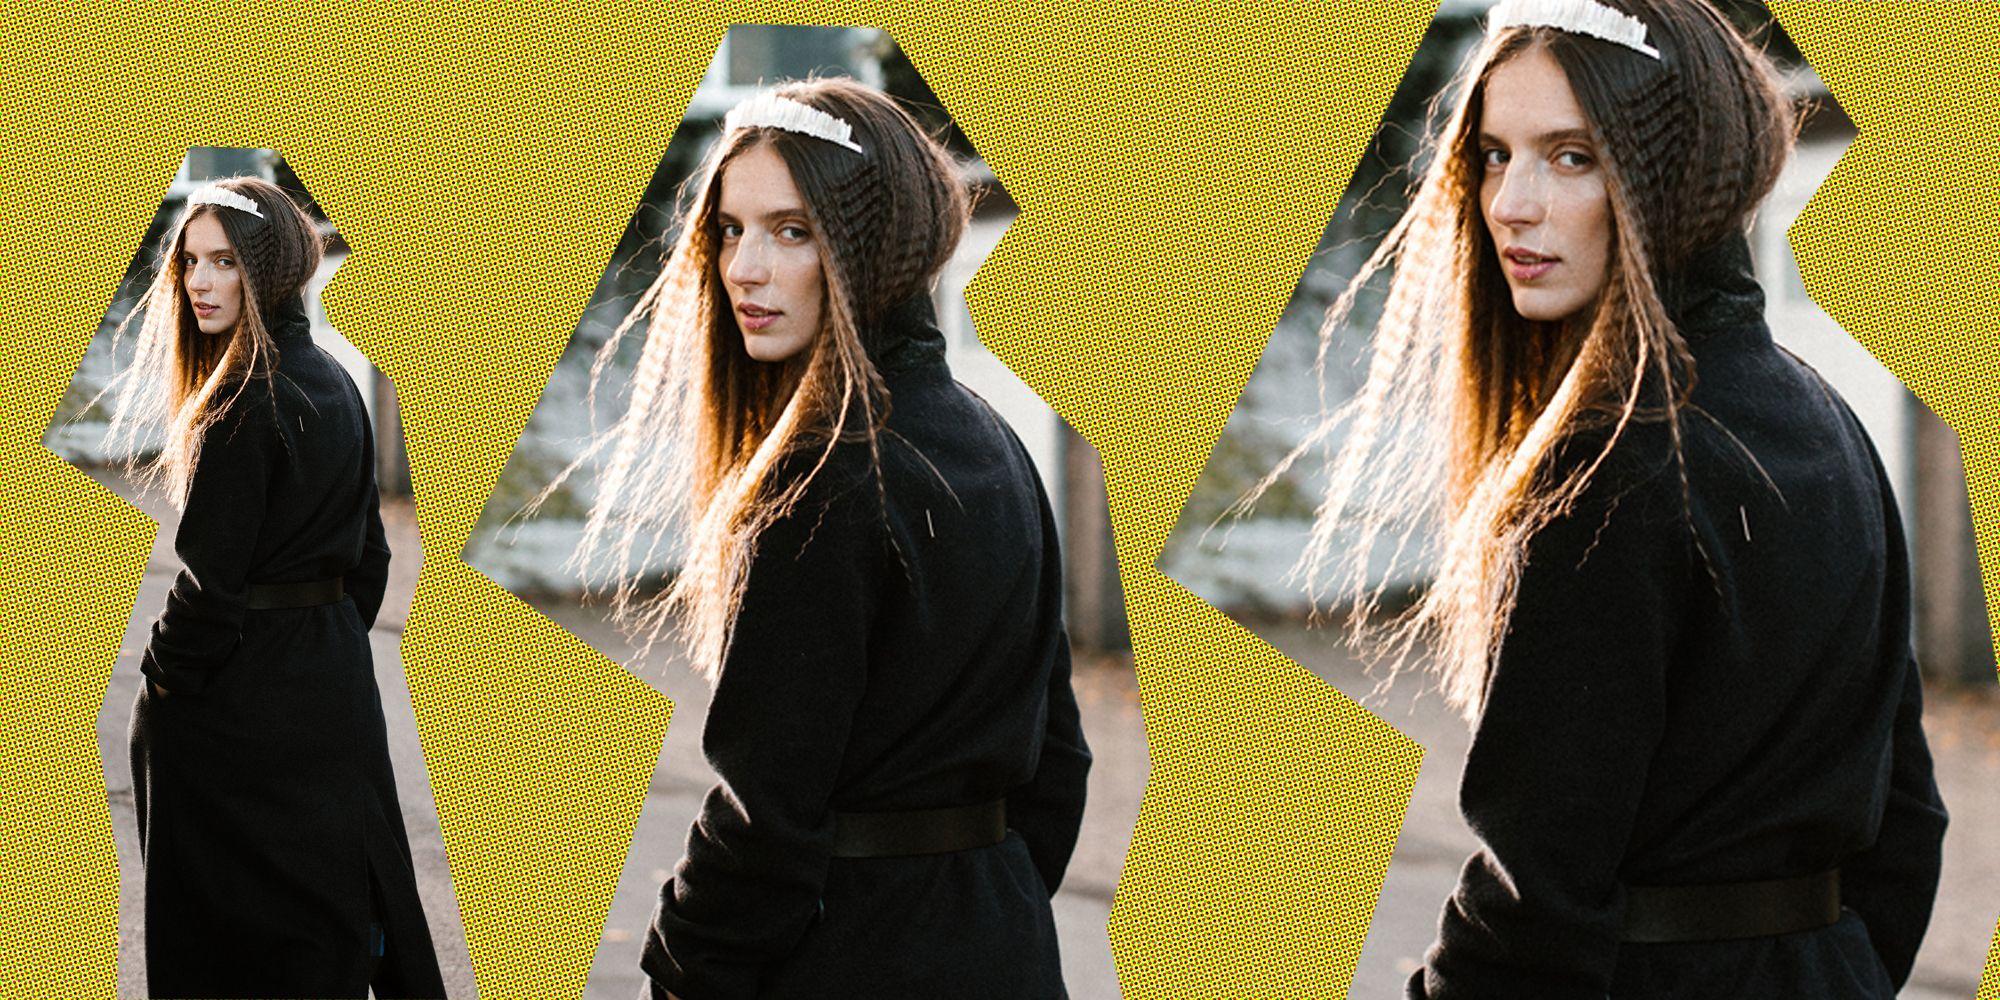 Nina Varga door Amanda Drost